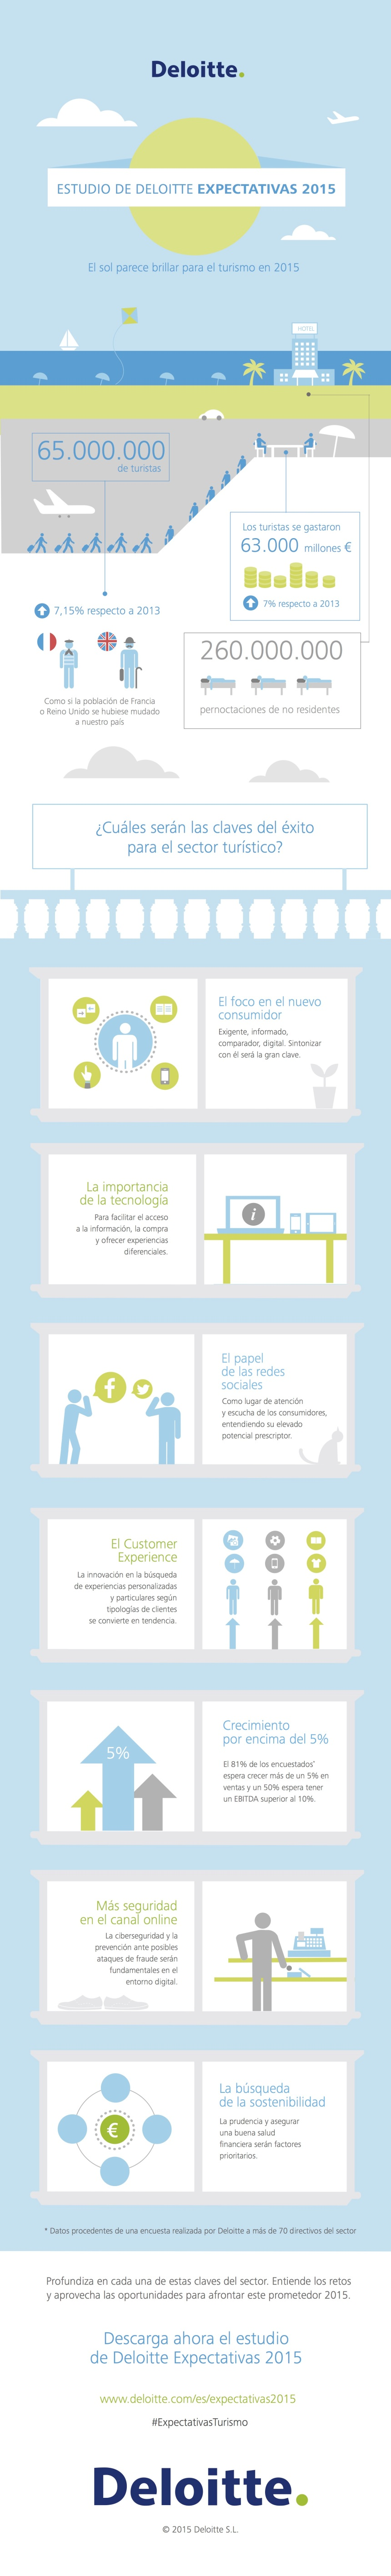 Estudio sobre turismo en España 2015